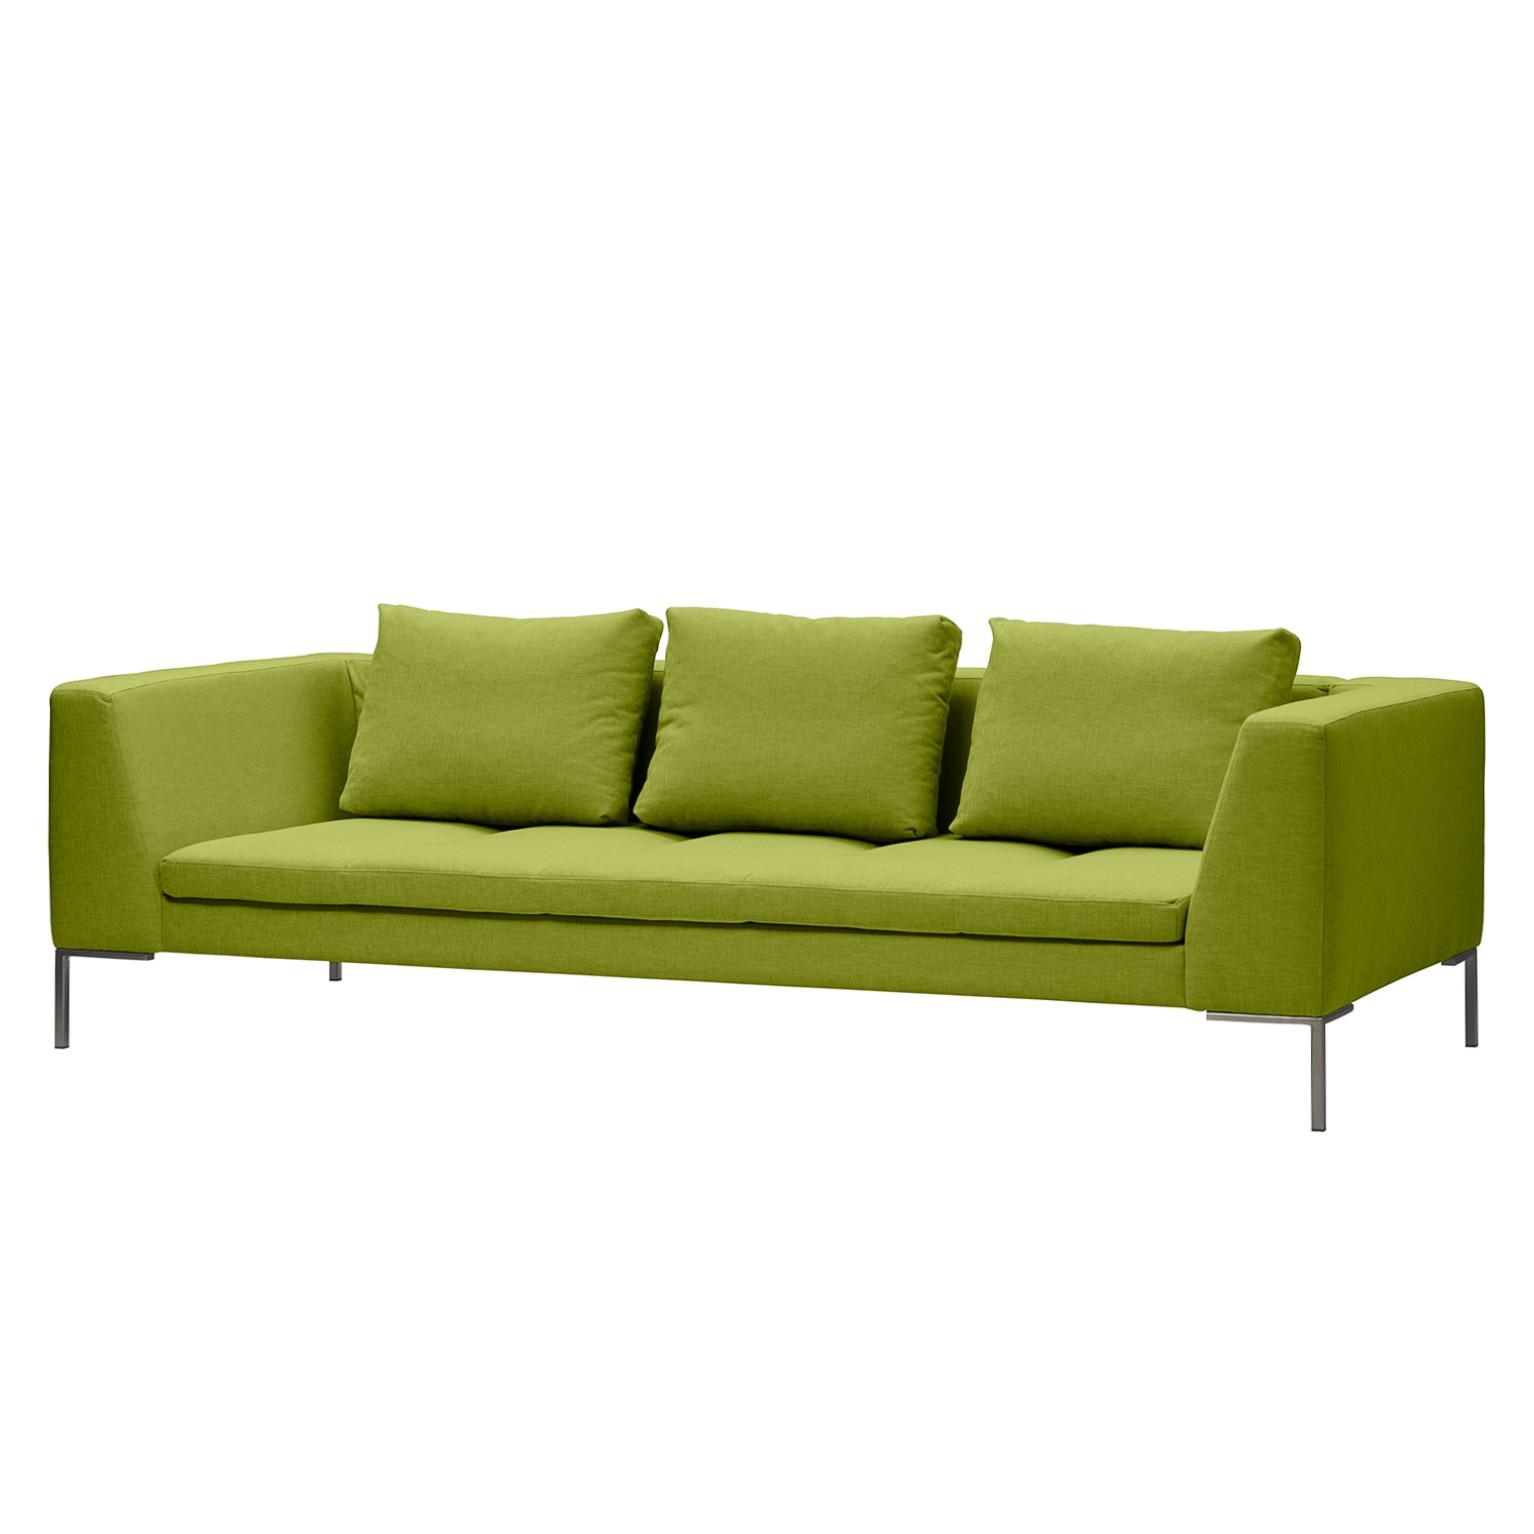 Sofa Madison (3-Sitzer) Webstoff - Stoff Anda II Grün